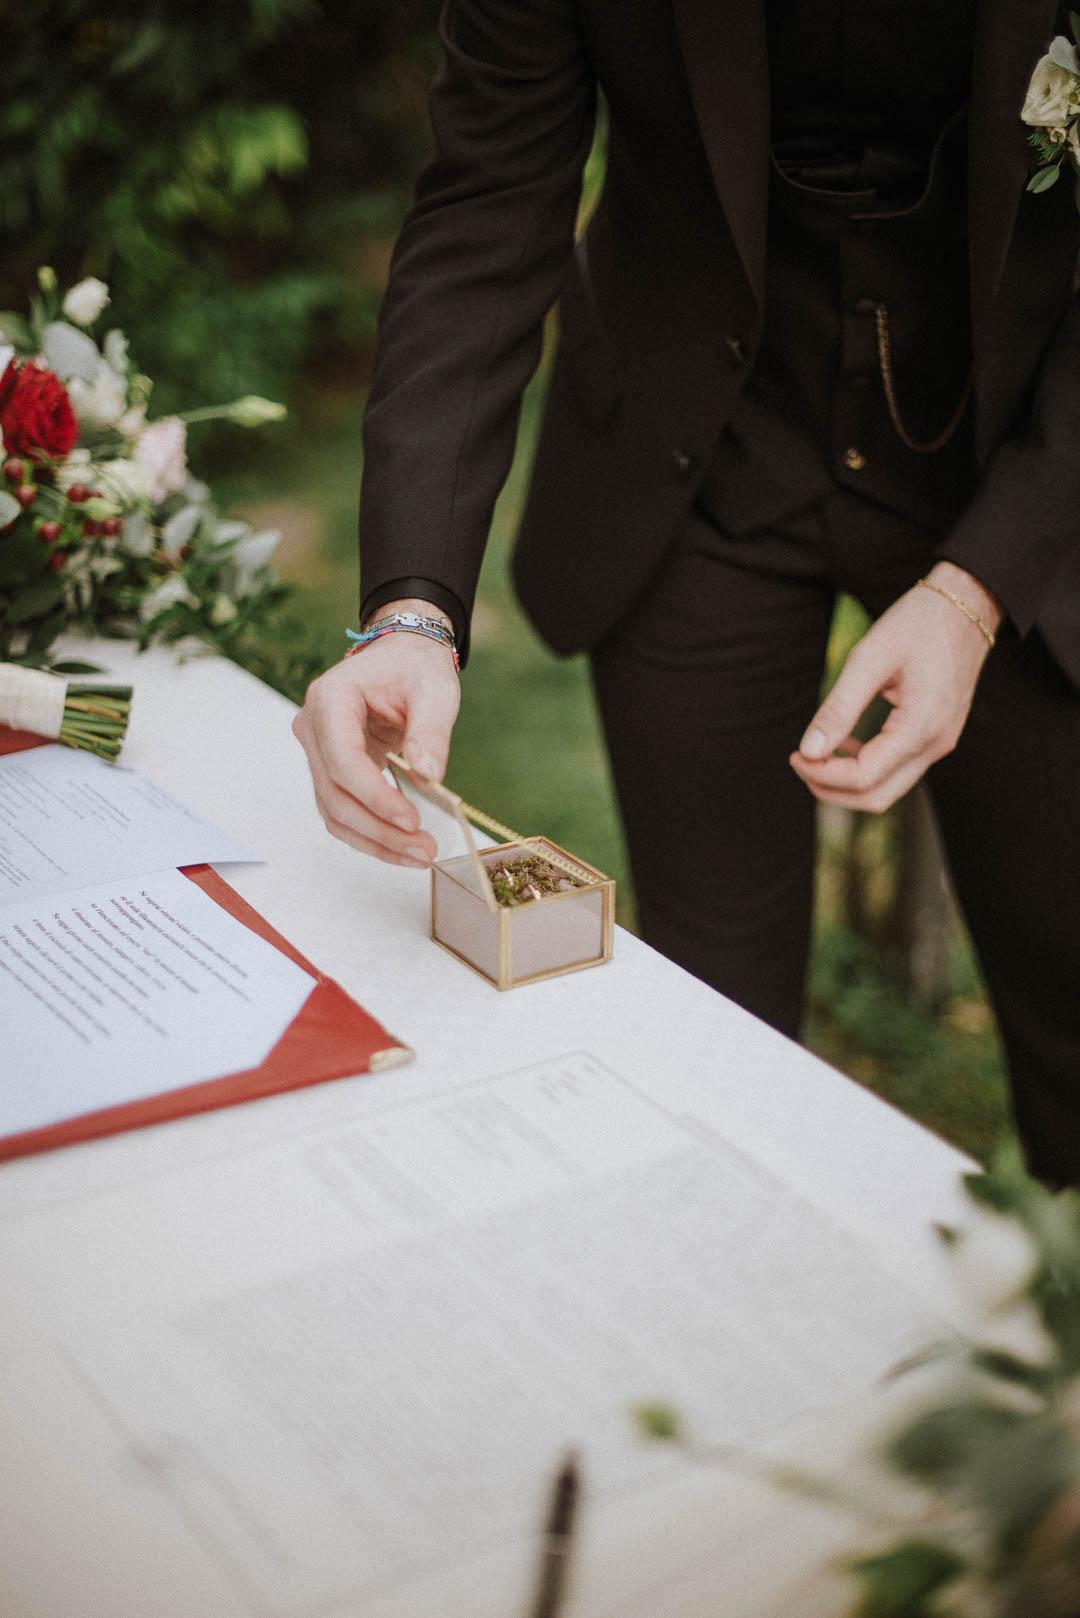 wedding-photographer-destination-fineart-bespoke-reportage-tuscany-villascorzi-vivianeizzo-spazio46-72